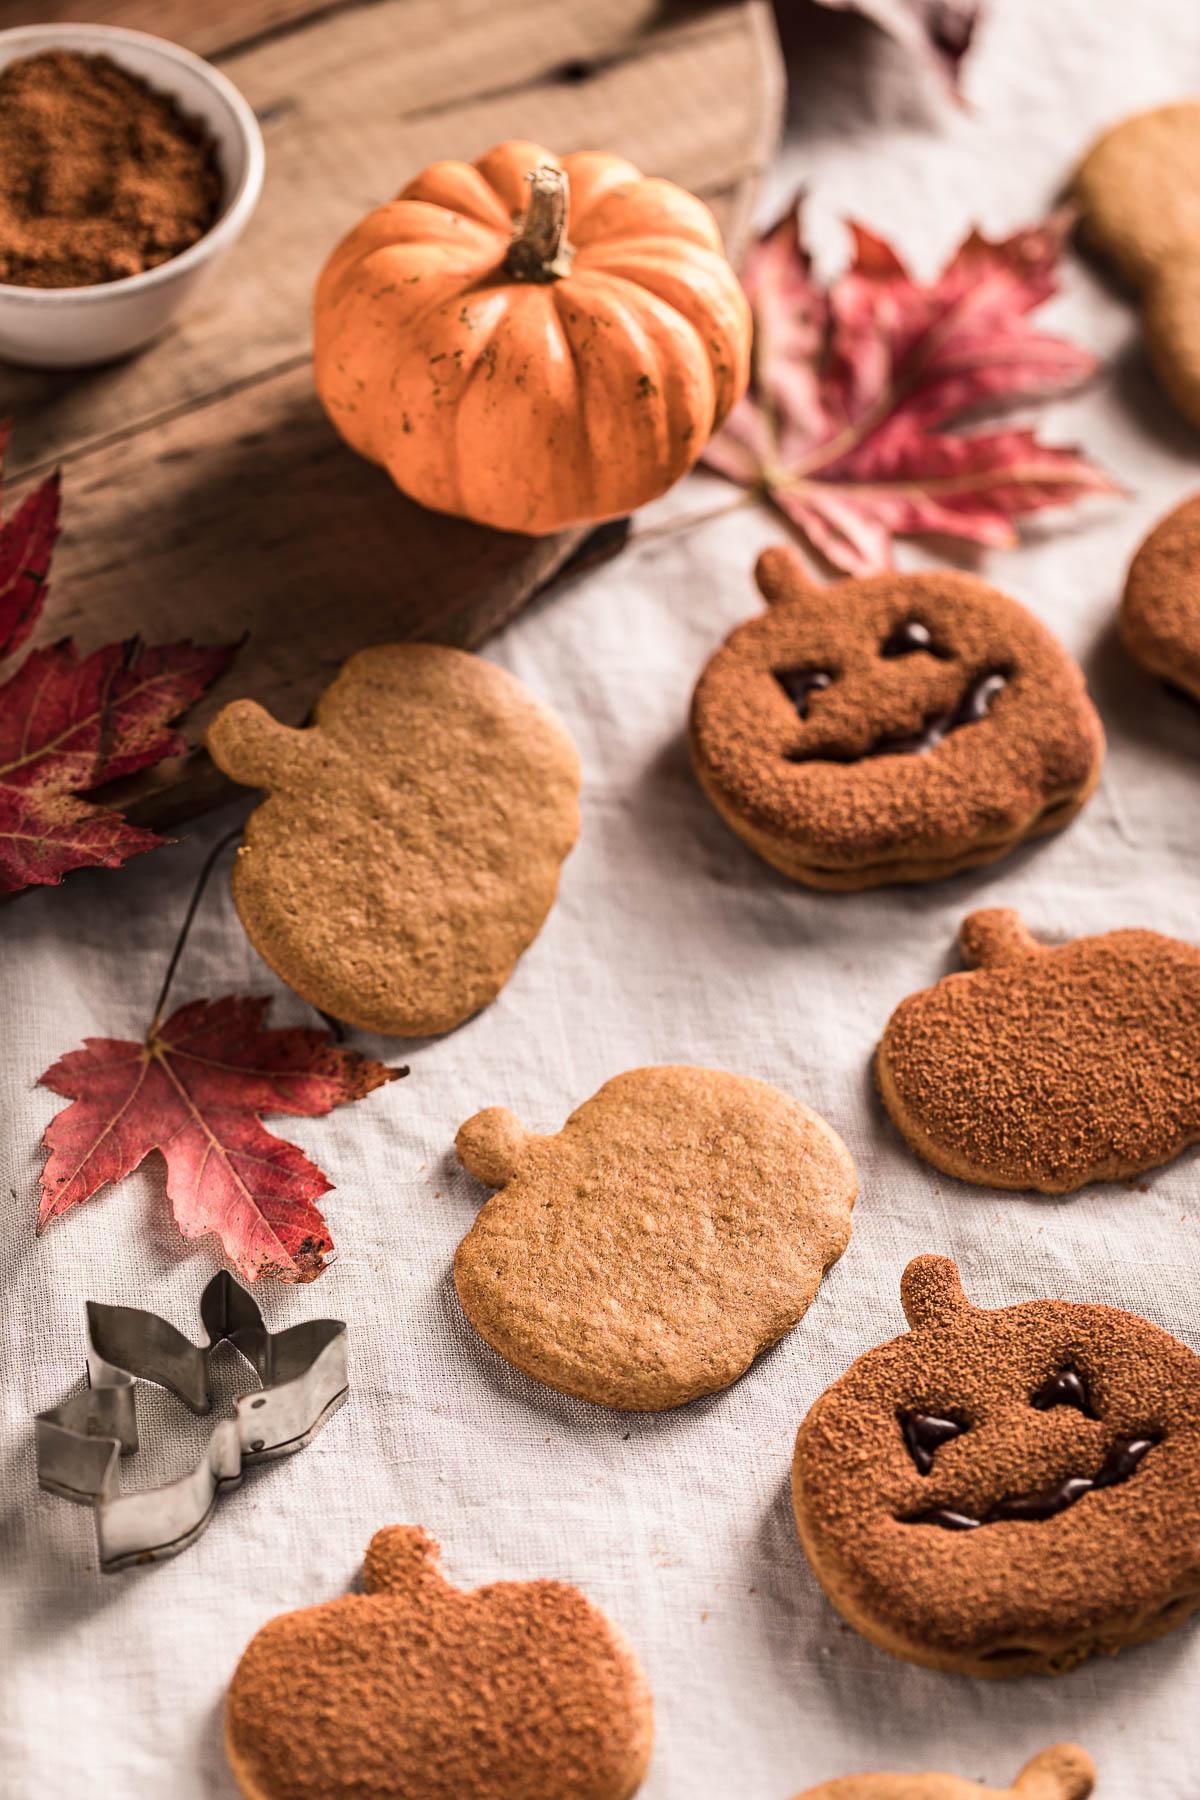 biscotti alla zucca vegan integrali senza uova senza burro ricetta frollini light vegan pumpkin cutout cookies recipe cinnamon sugar cookies